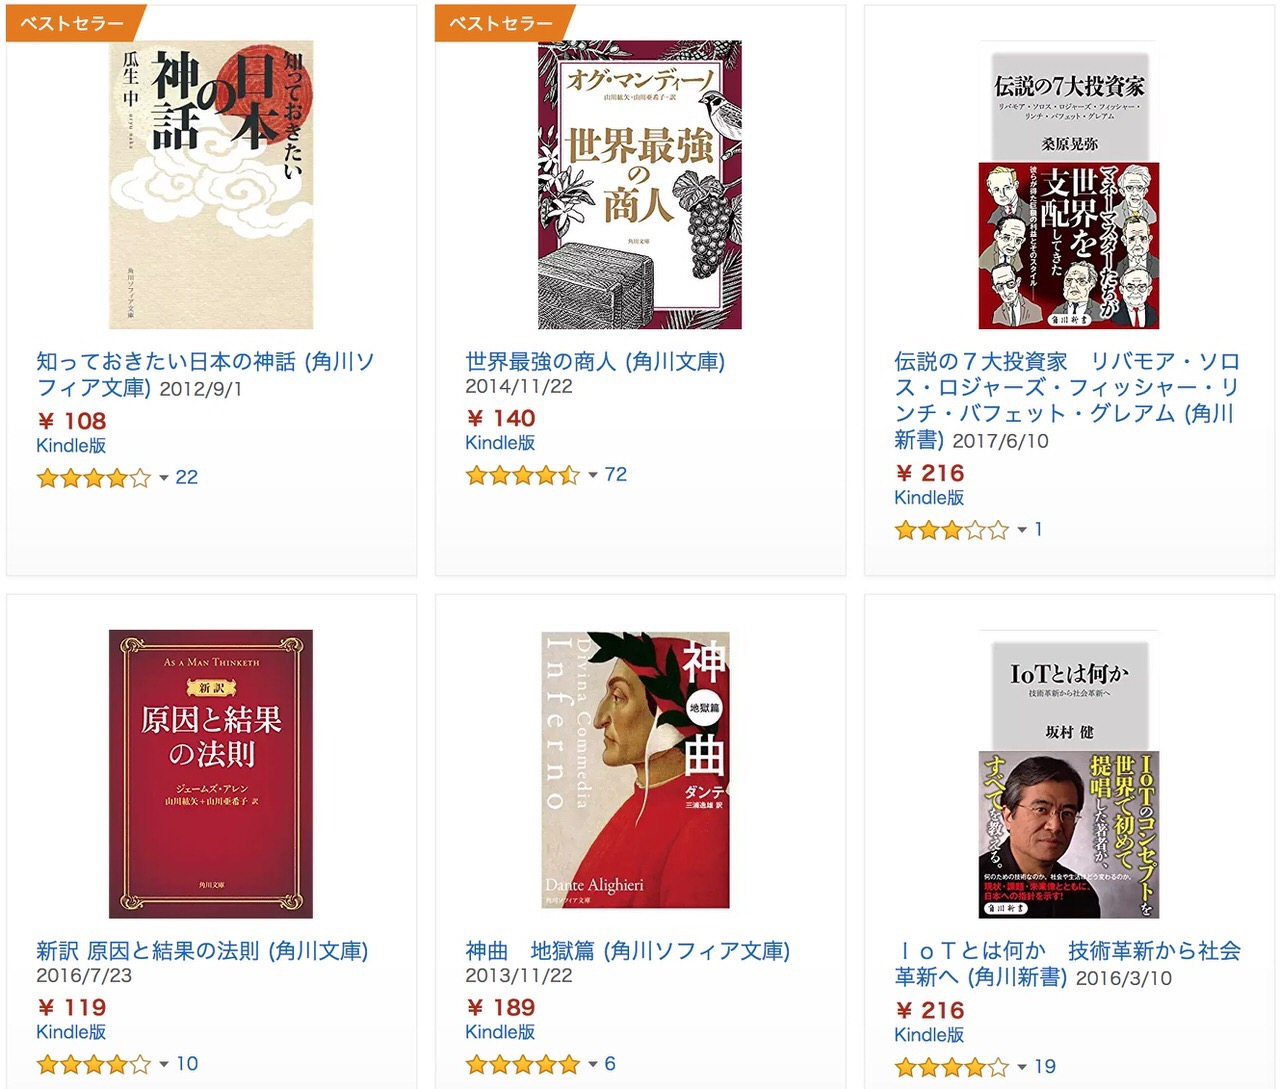 【Kindleセール】75%OFF「KADOKAWA Kindle限定75%OFFセール」開催中(2018年8月30日まで)